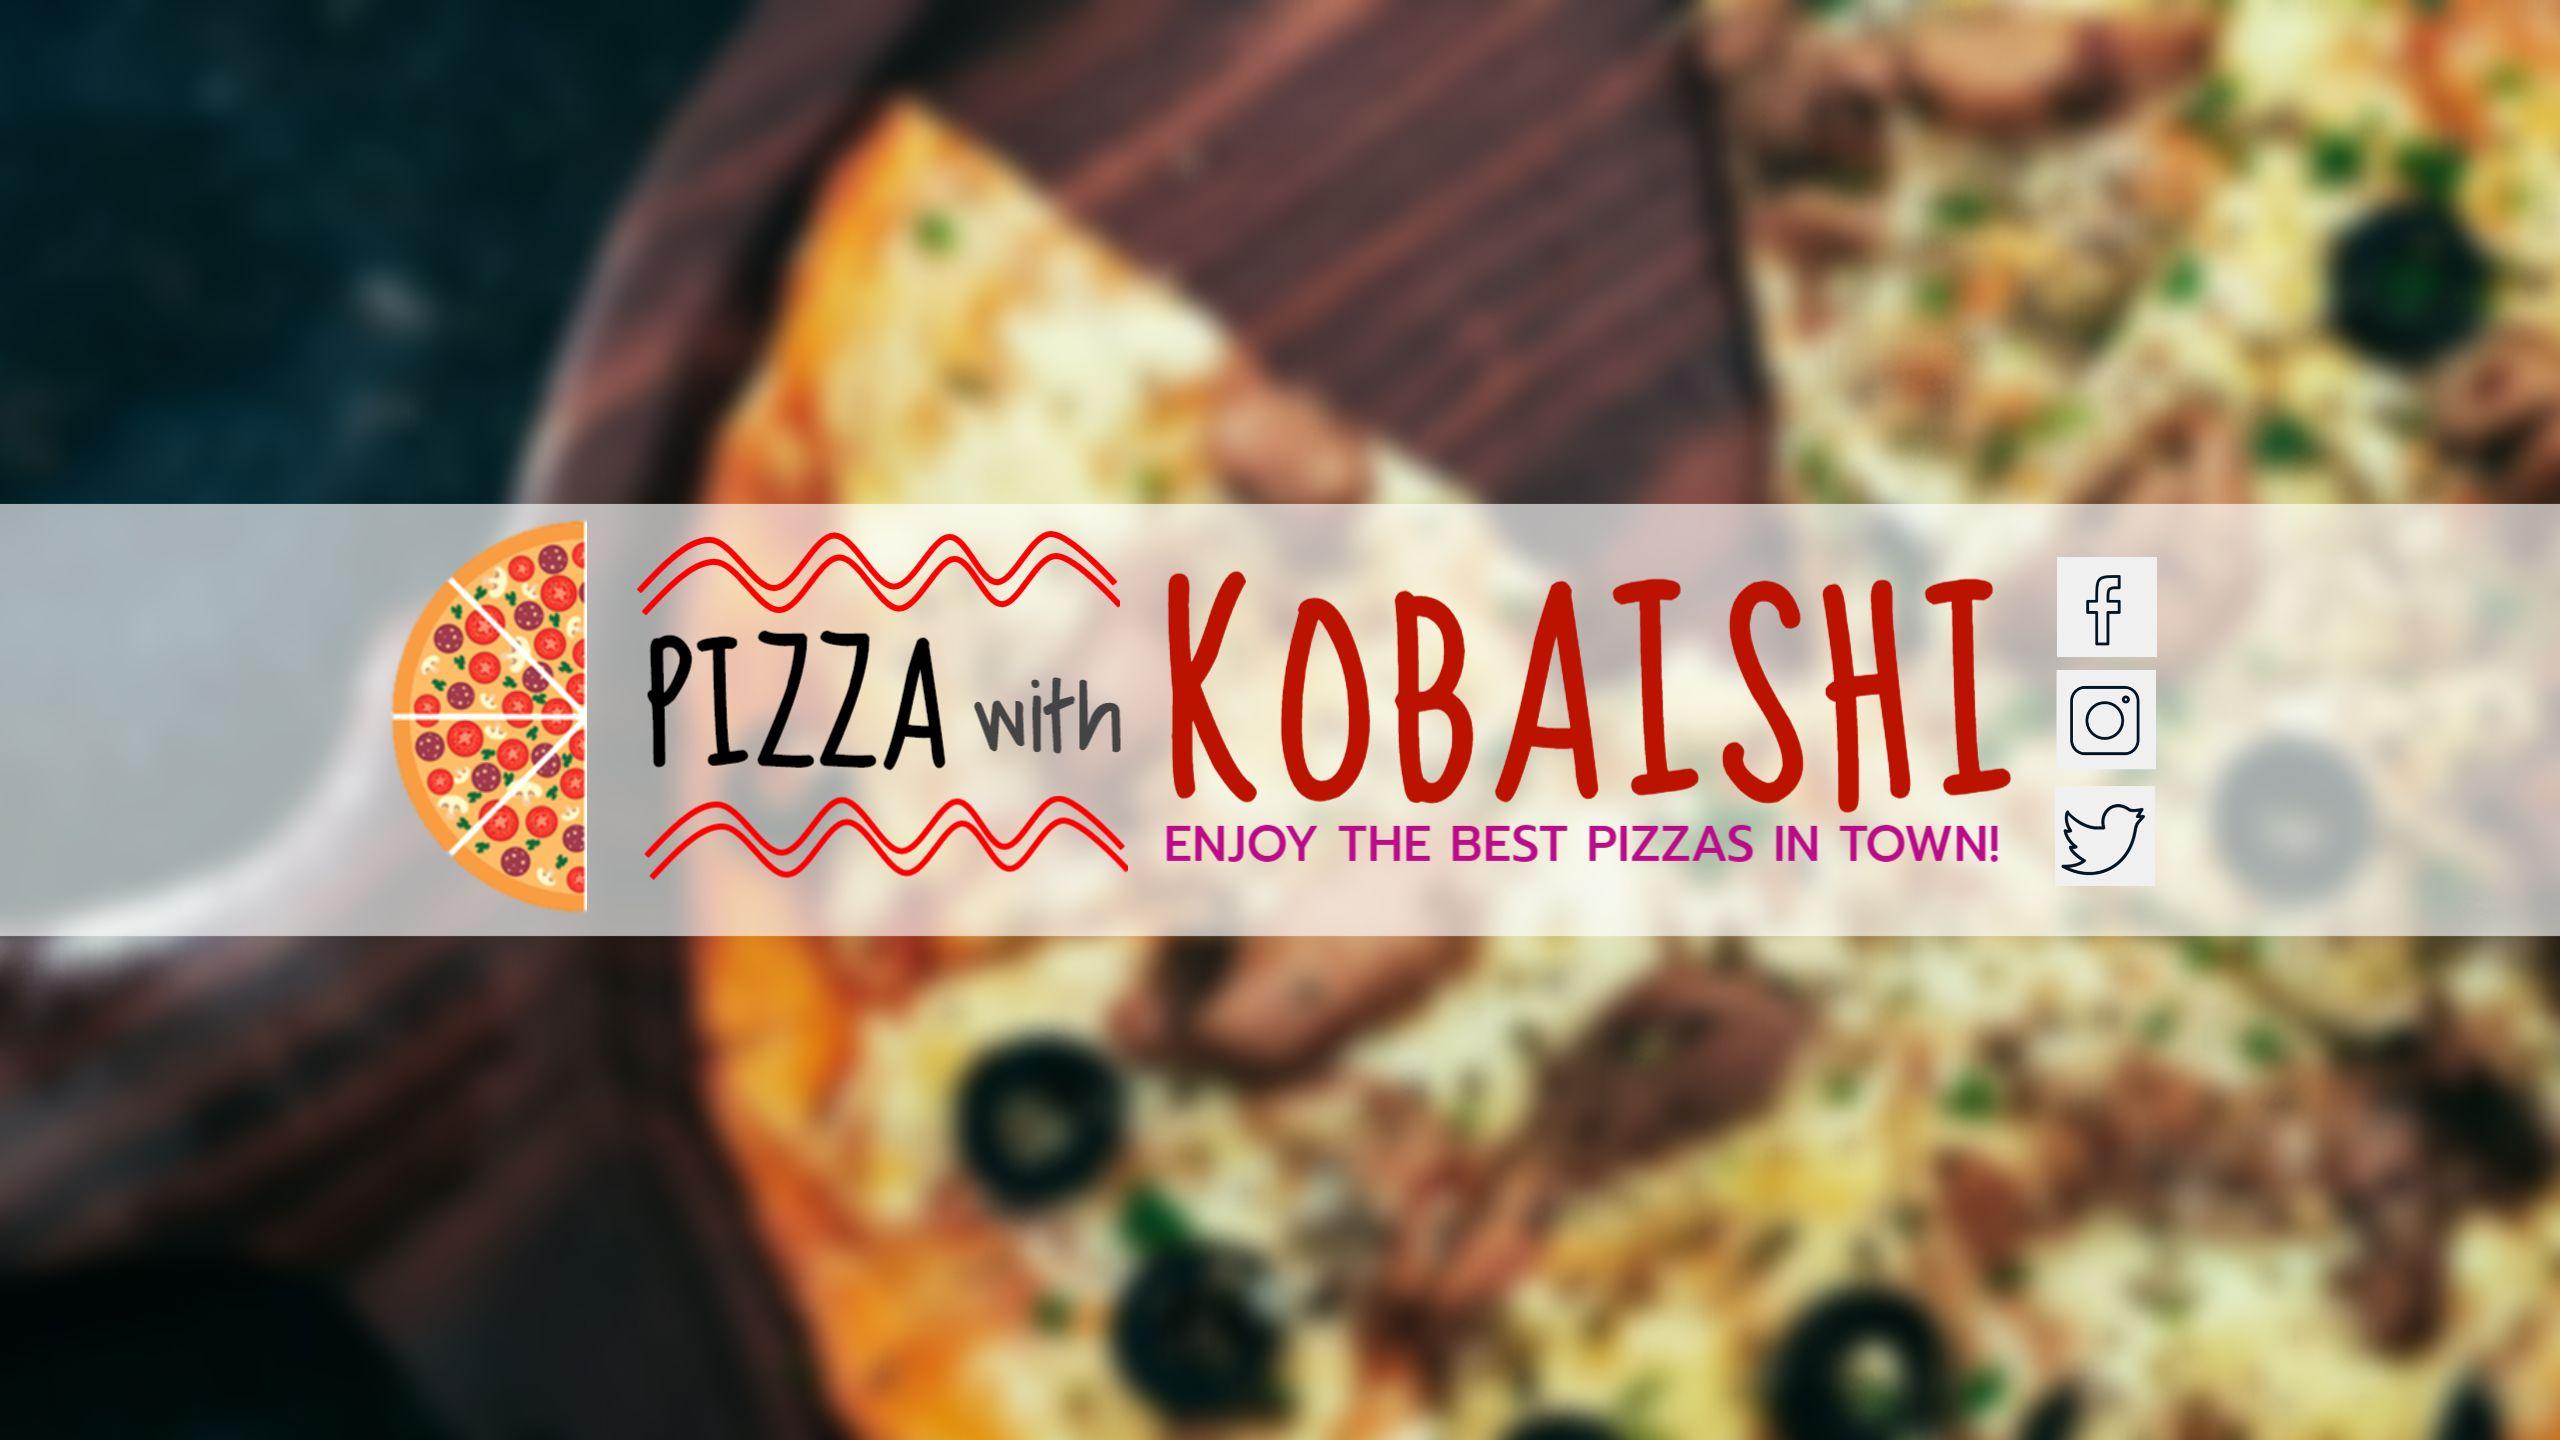 Pizza Restaurant Youtube Banner Template